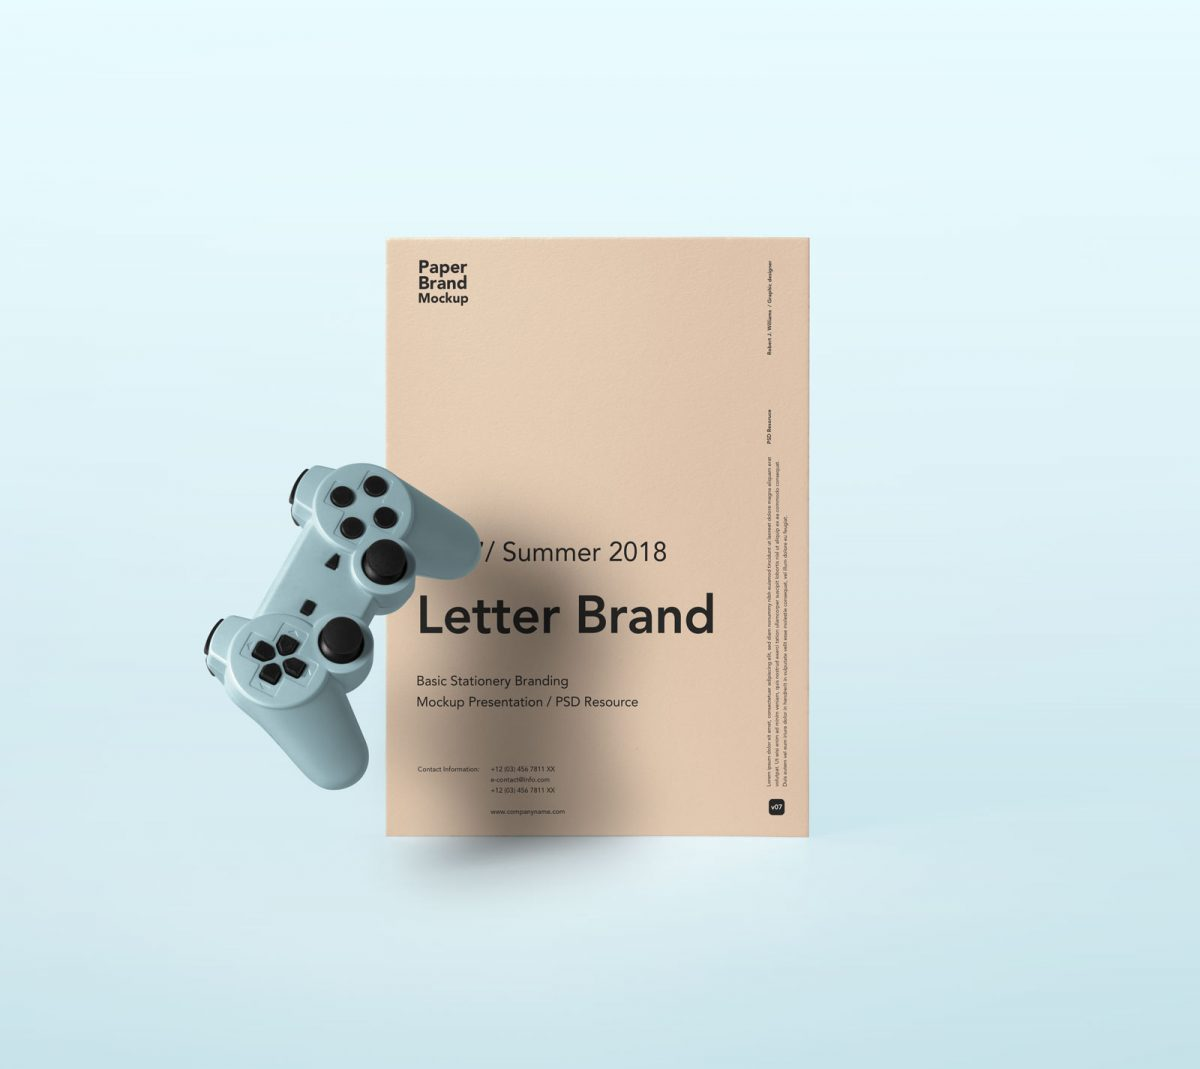 Paper-Brand-Mockup-Vol7